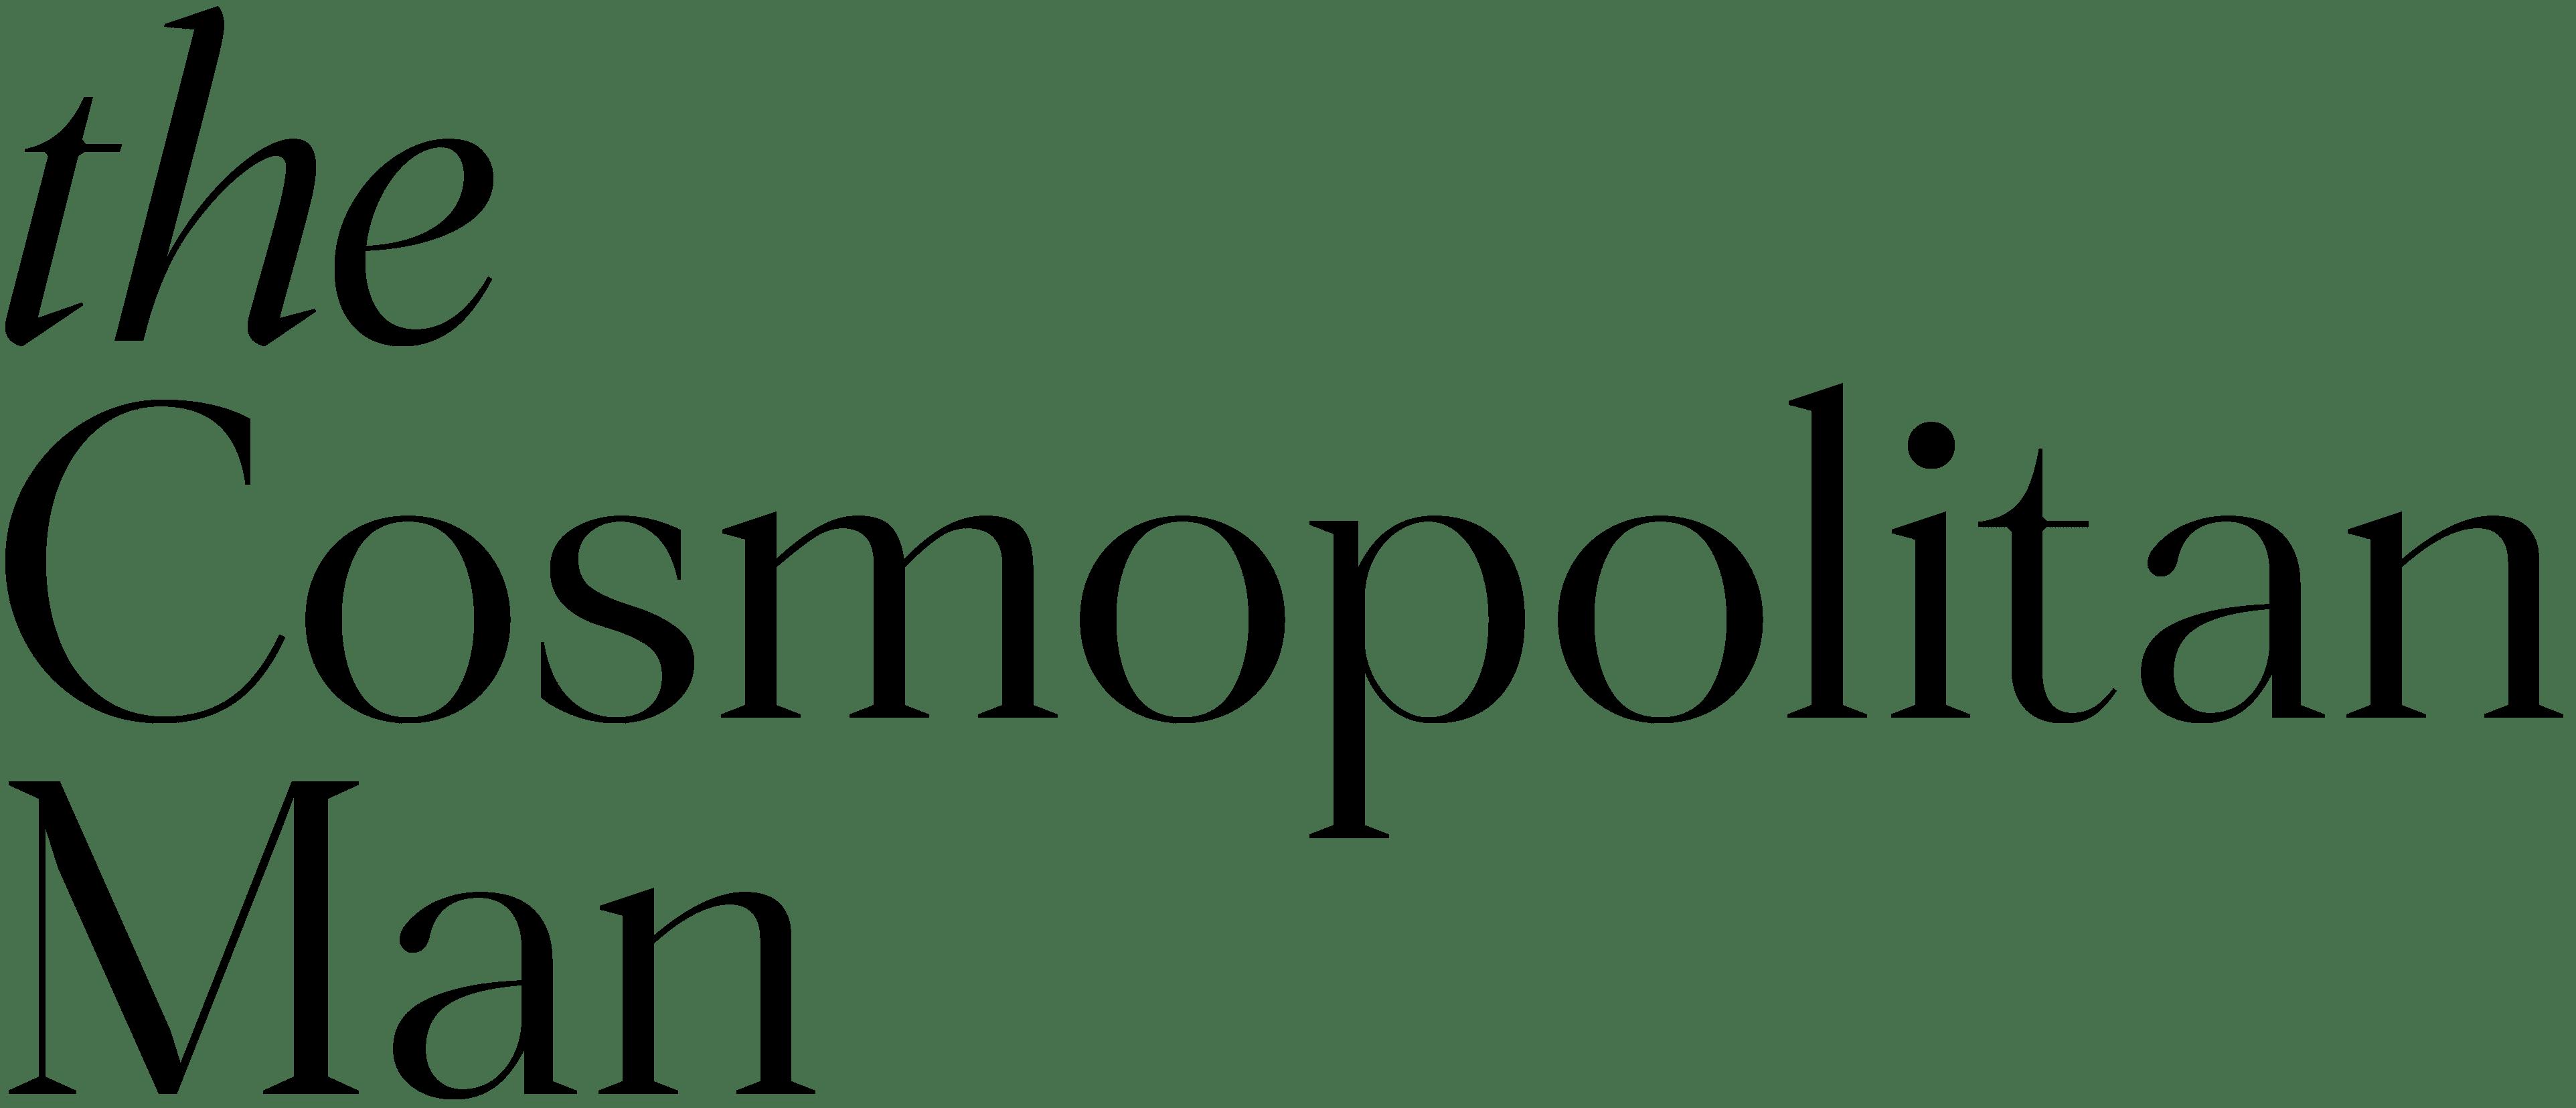 The Cosmopolitan Man